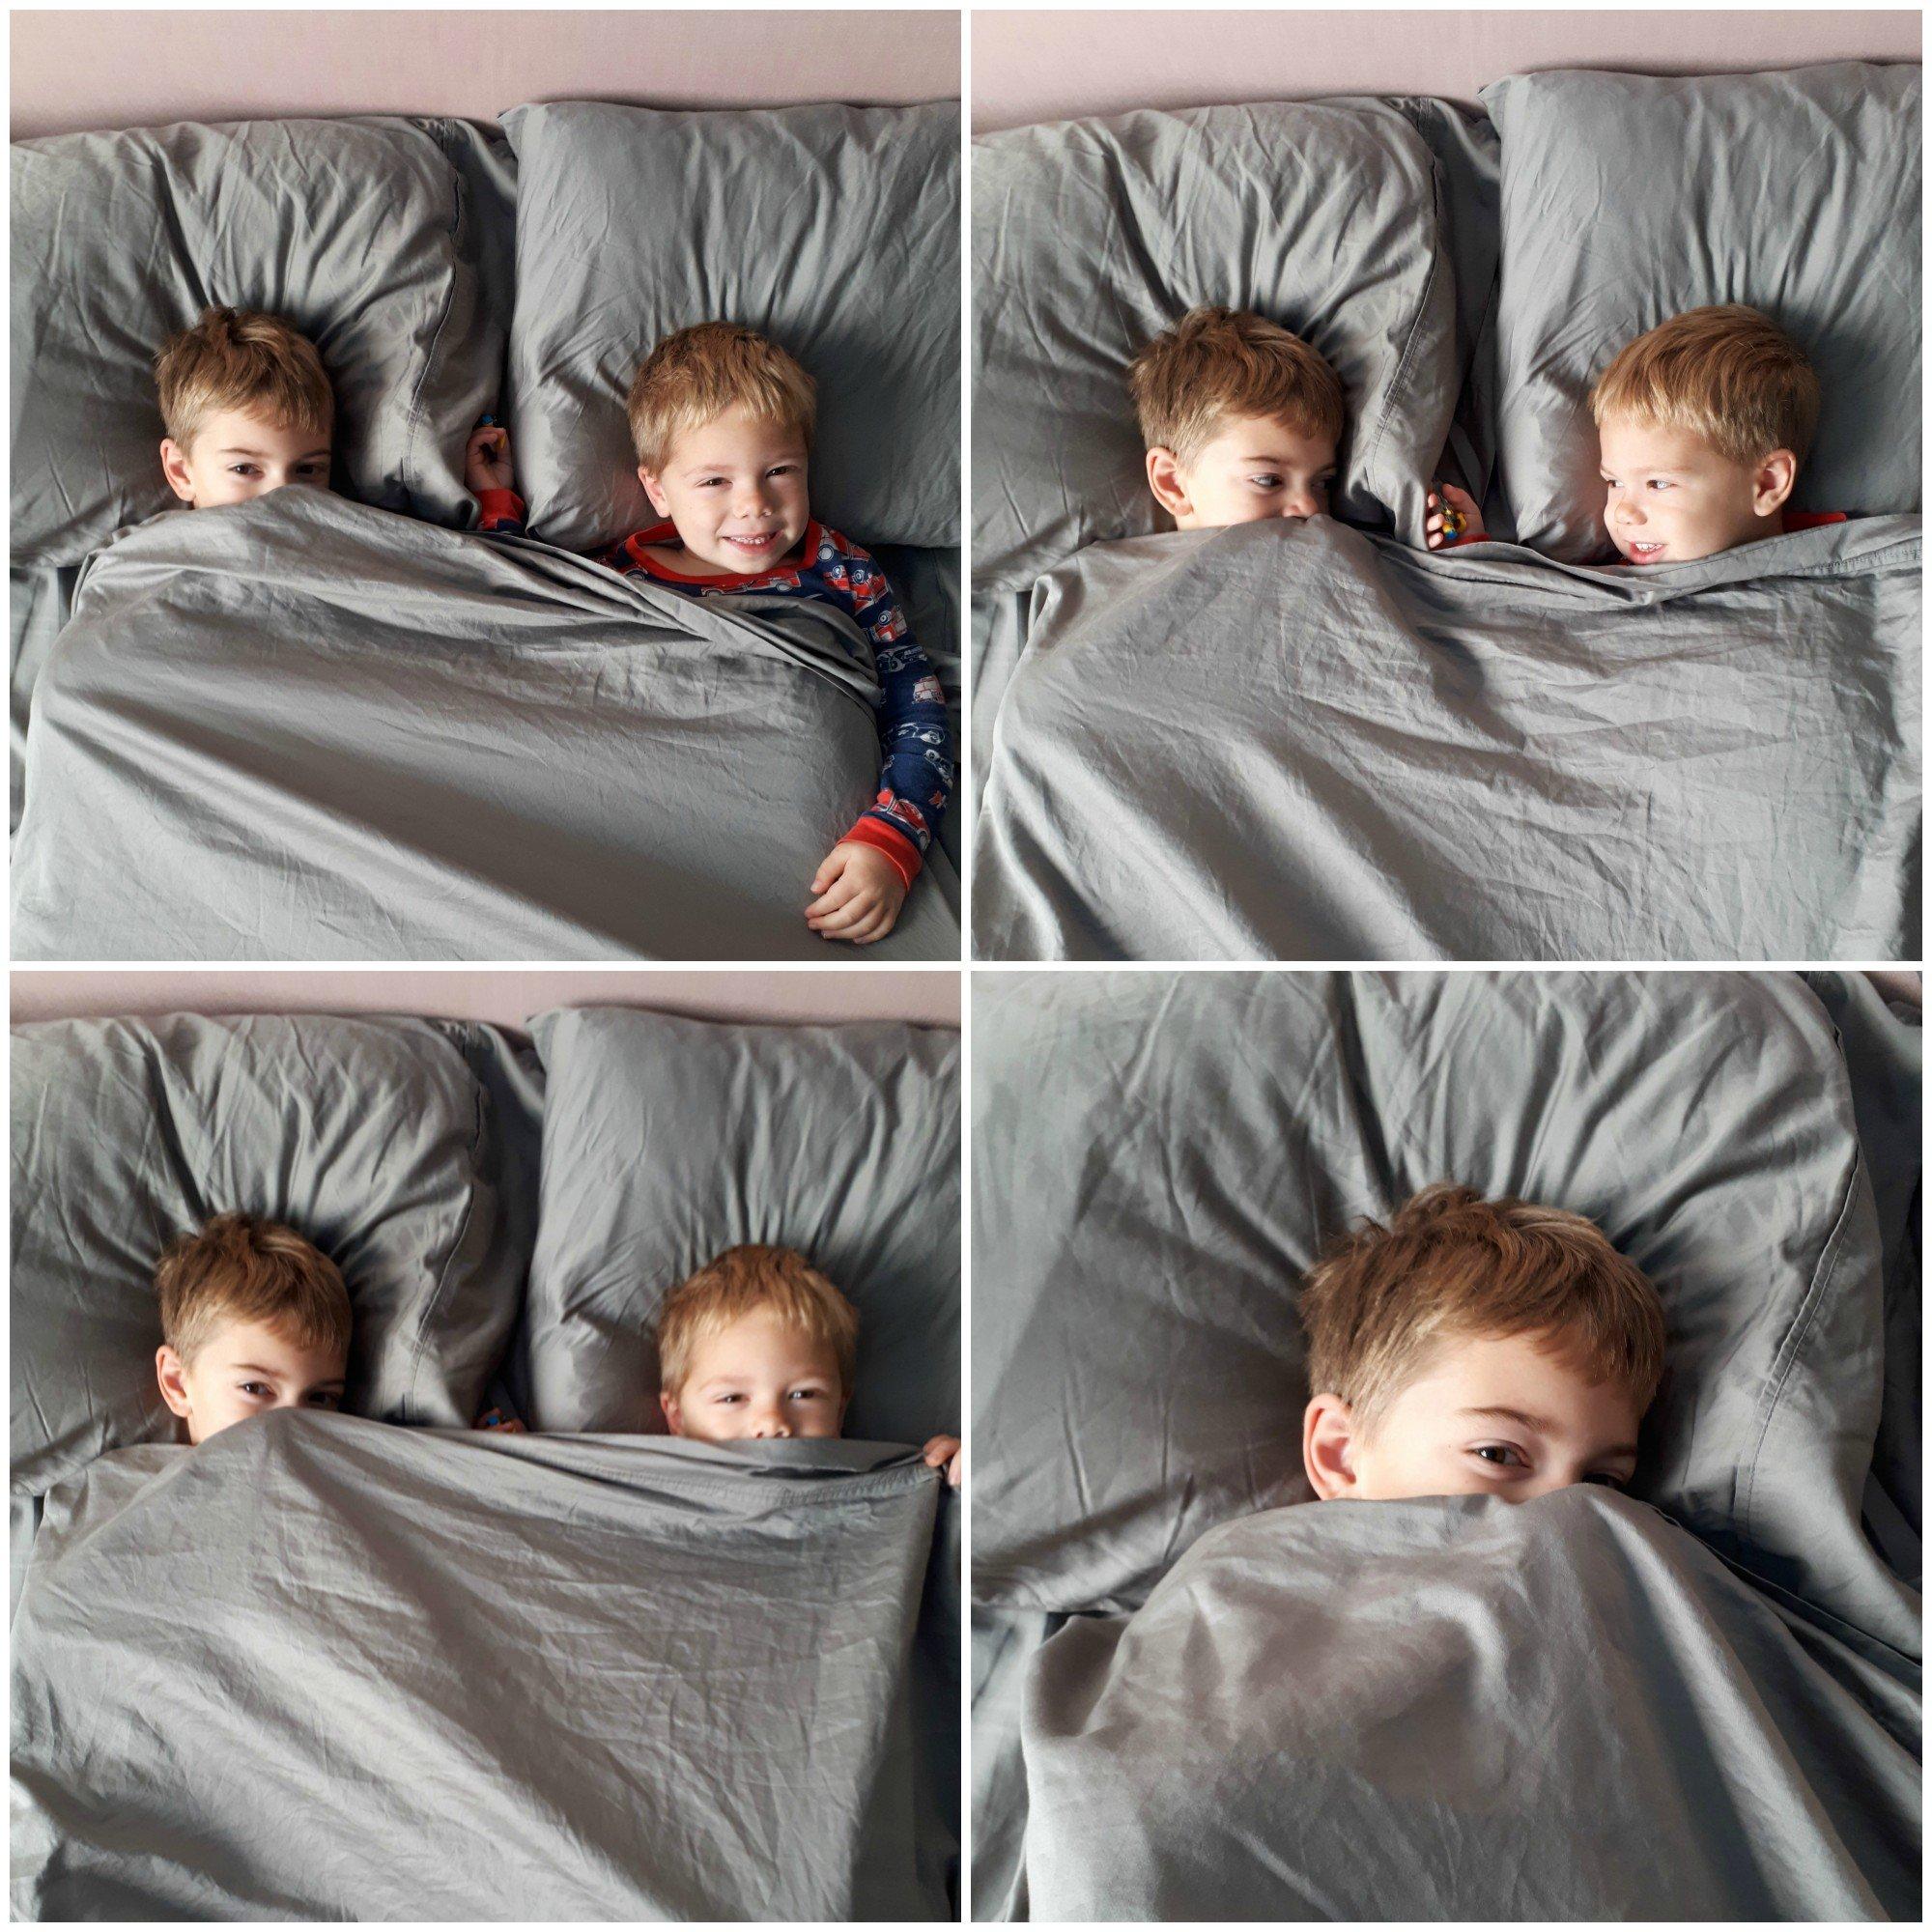 California Design Den 100% cotton sheets. My boys sure love getting cozy!